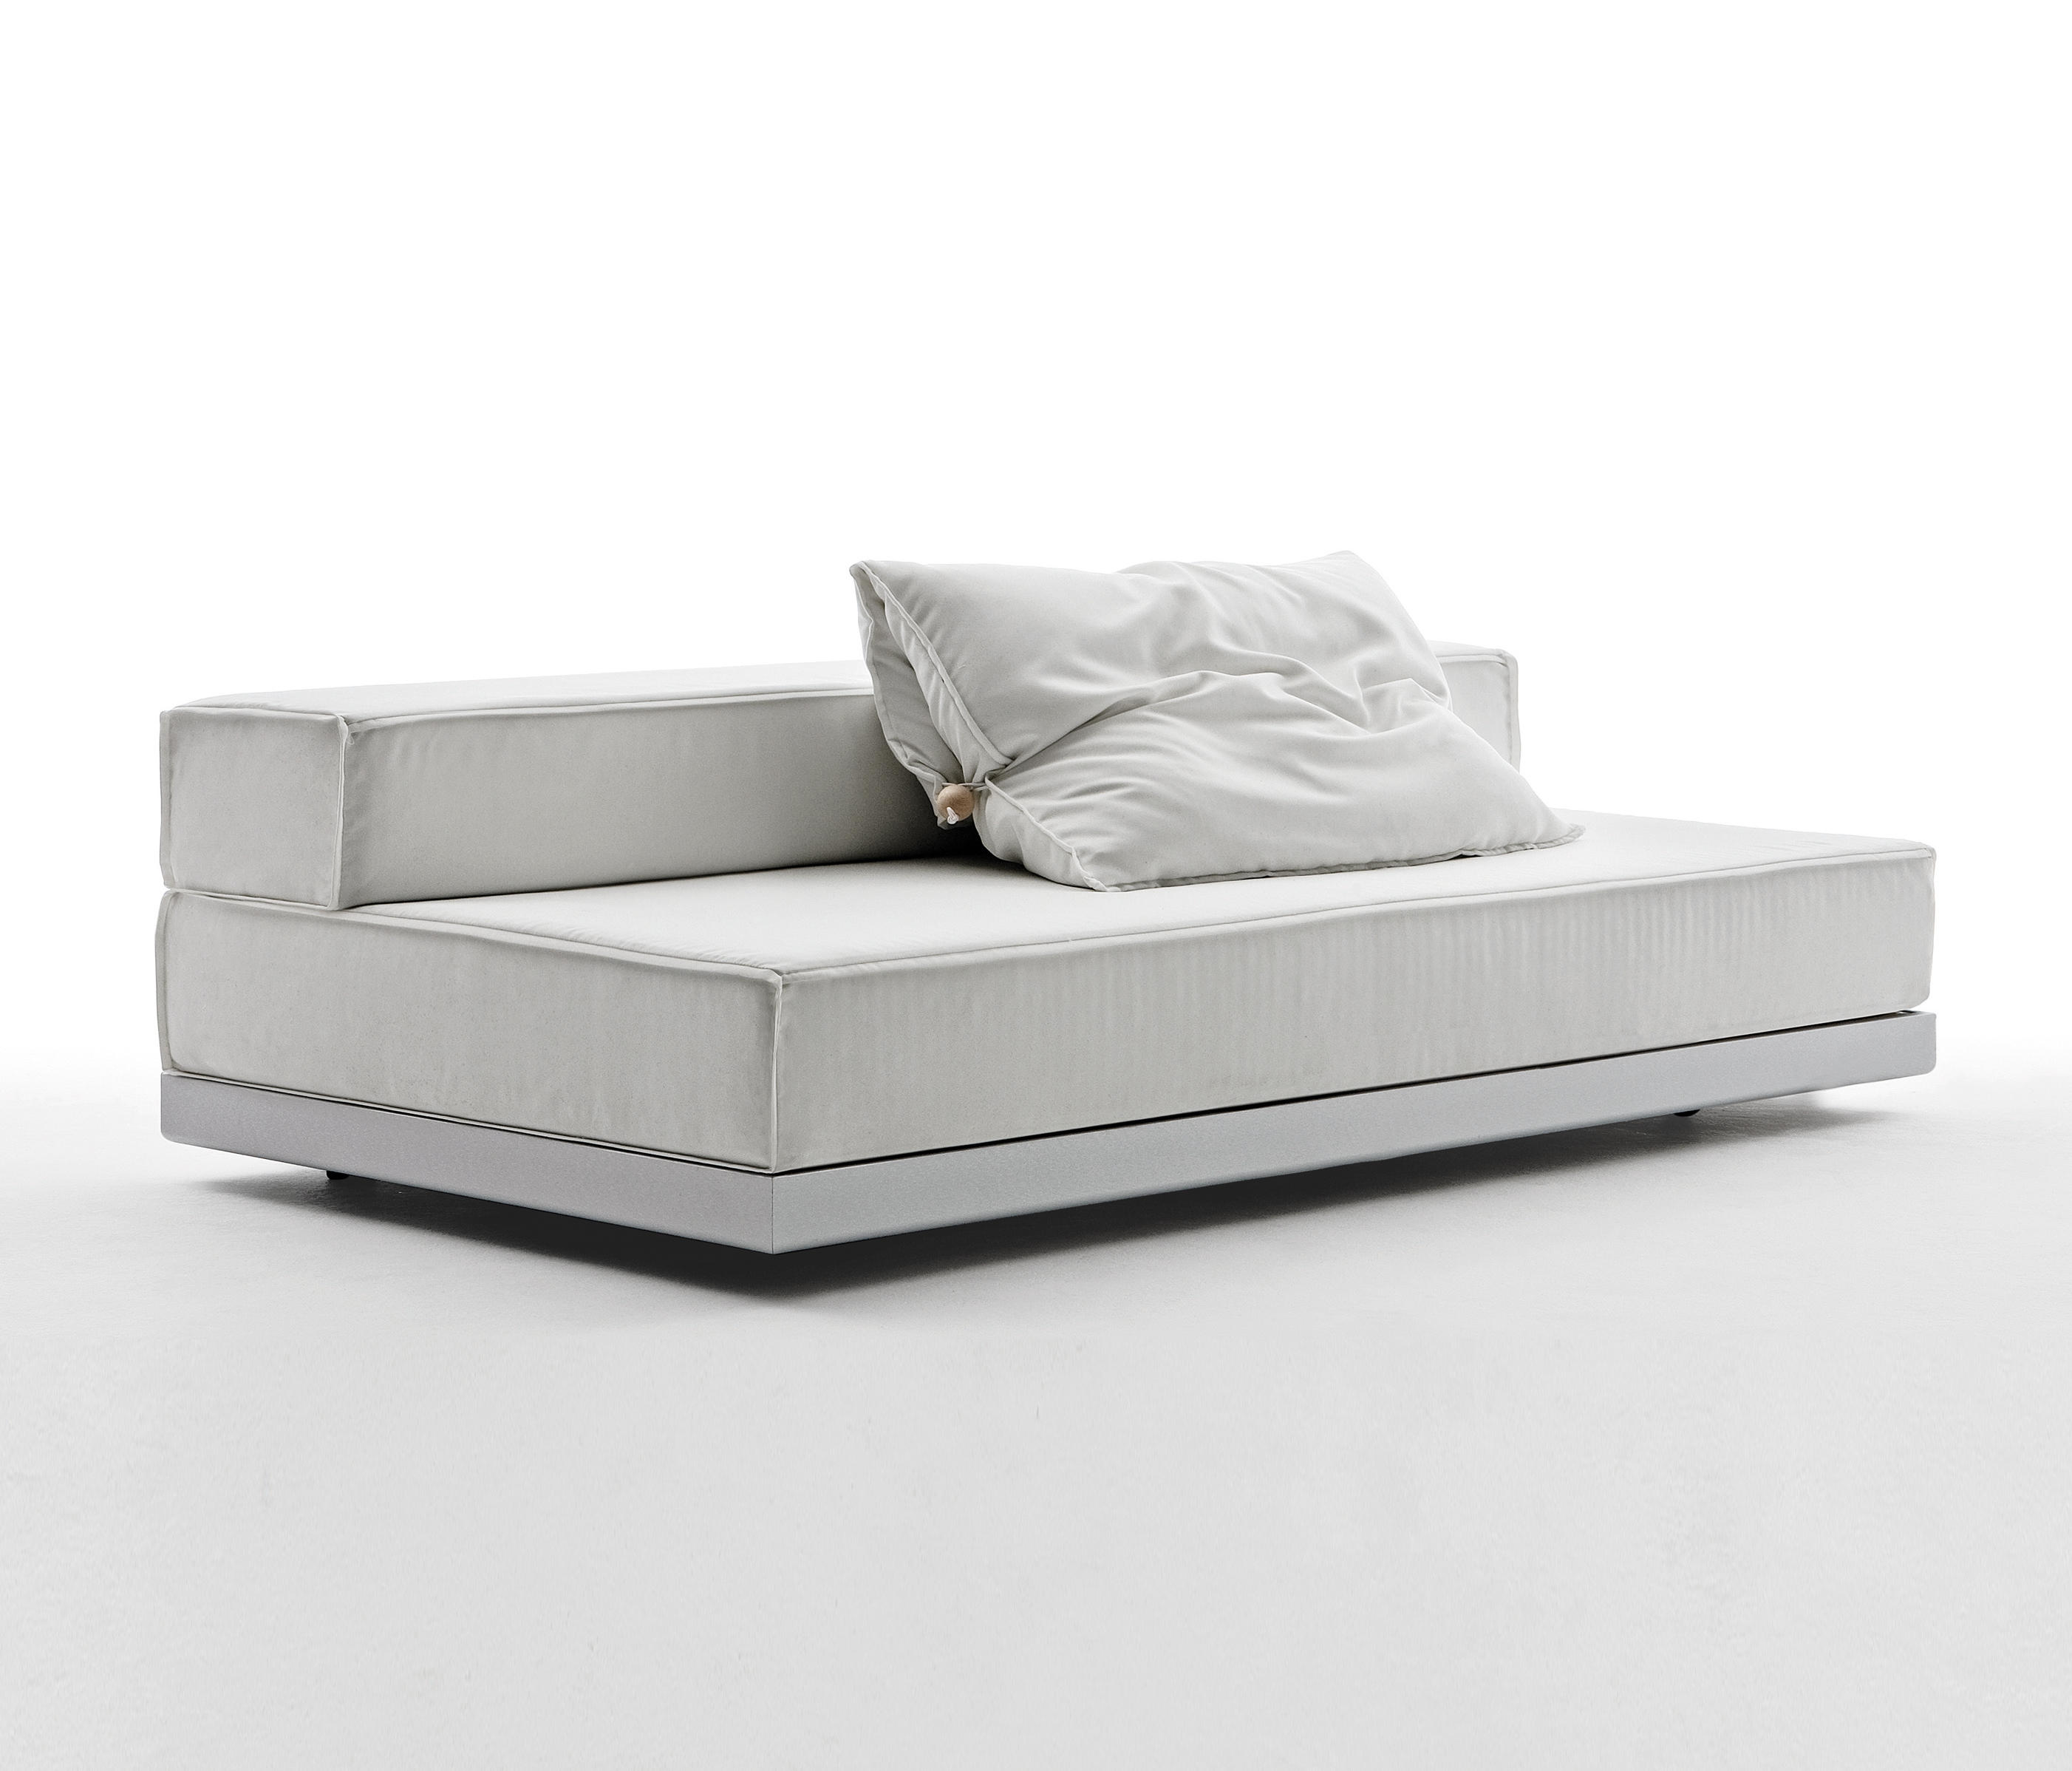 Bed Breakfast Sofa By Saba Italia Sofas